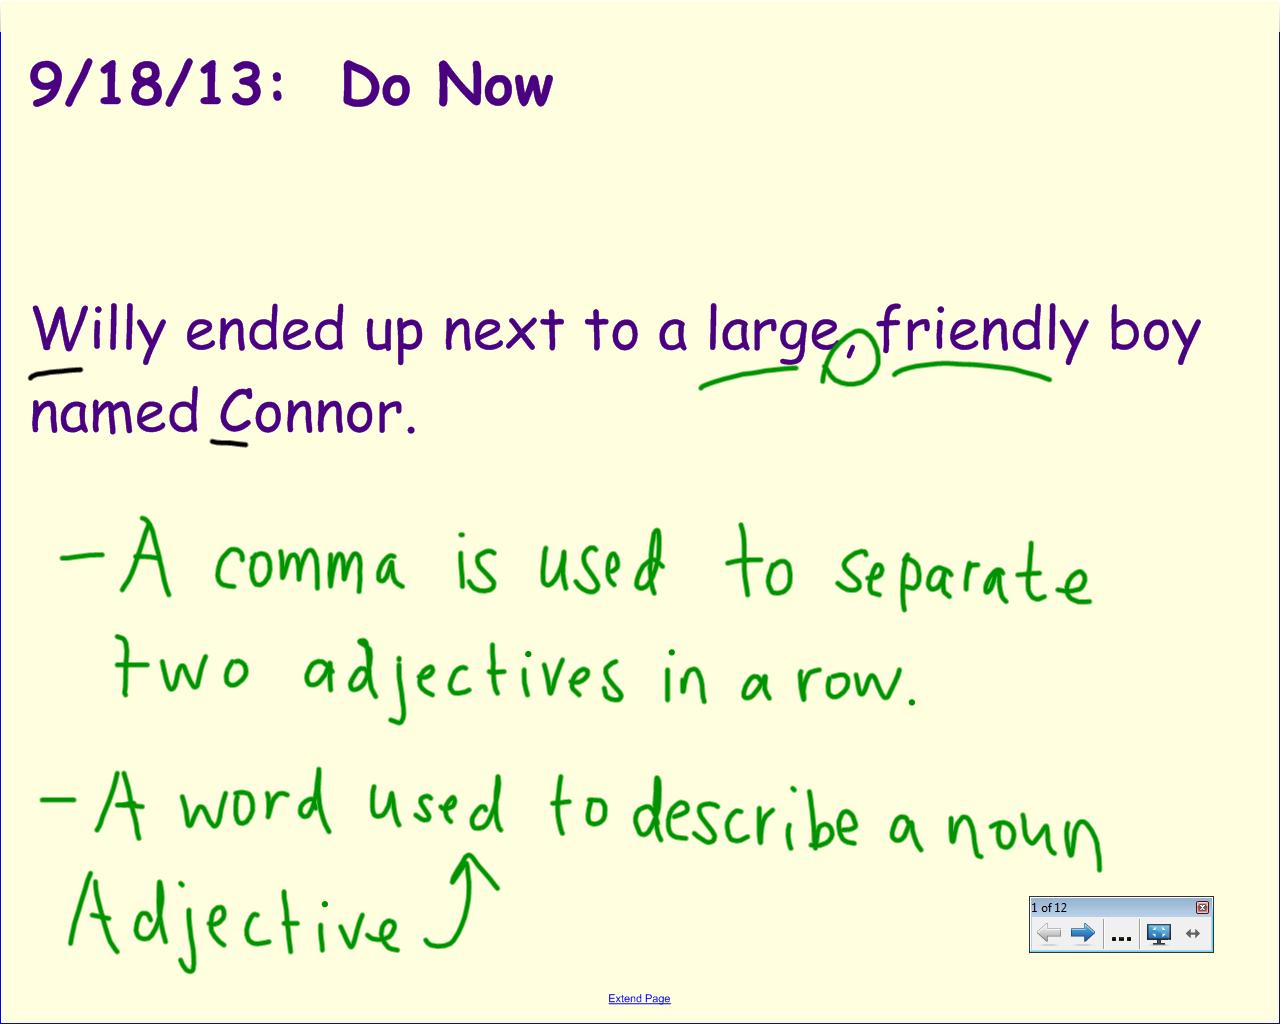 Middle School Teacher To Literacy Coach Using Mentor Sentences To Improve Grammar And Mechanics